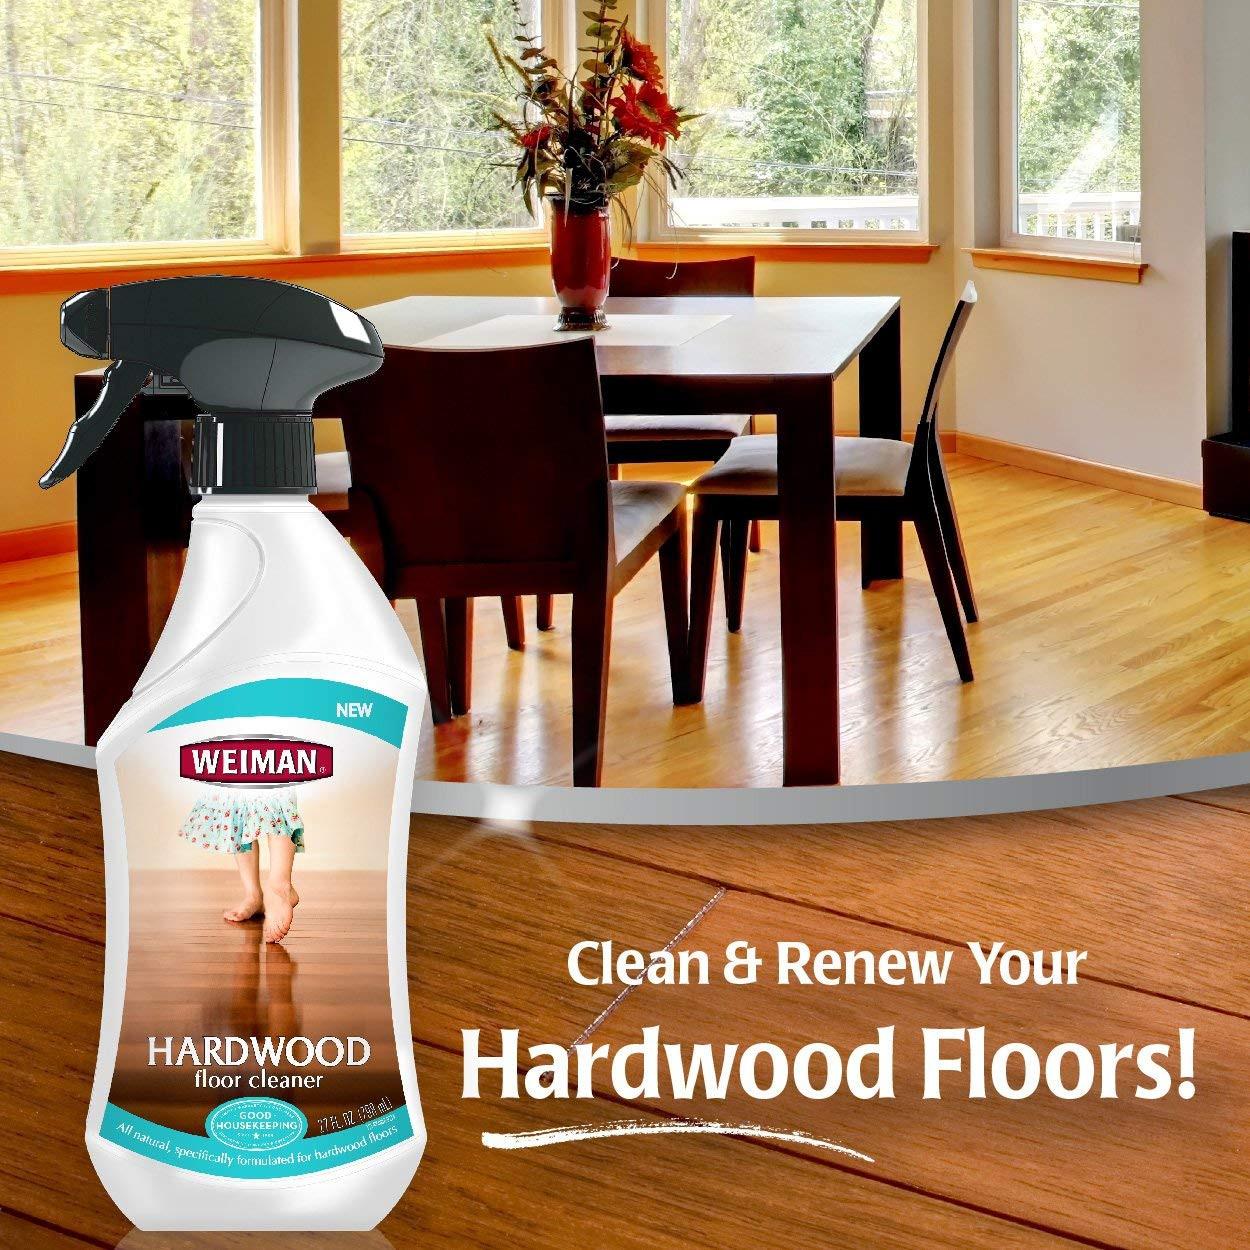 19 Ideal Pet Friendly Hardwood Floors